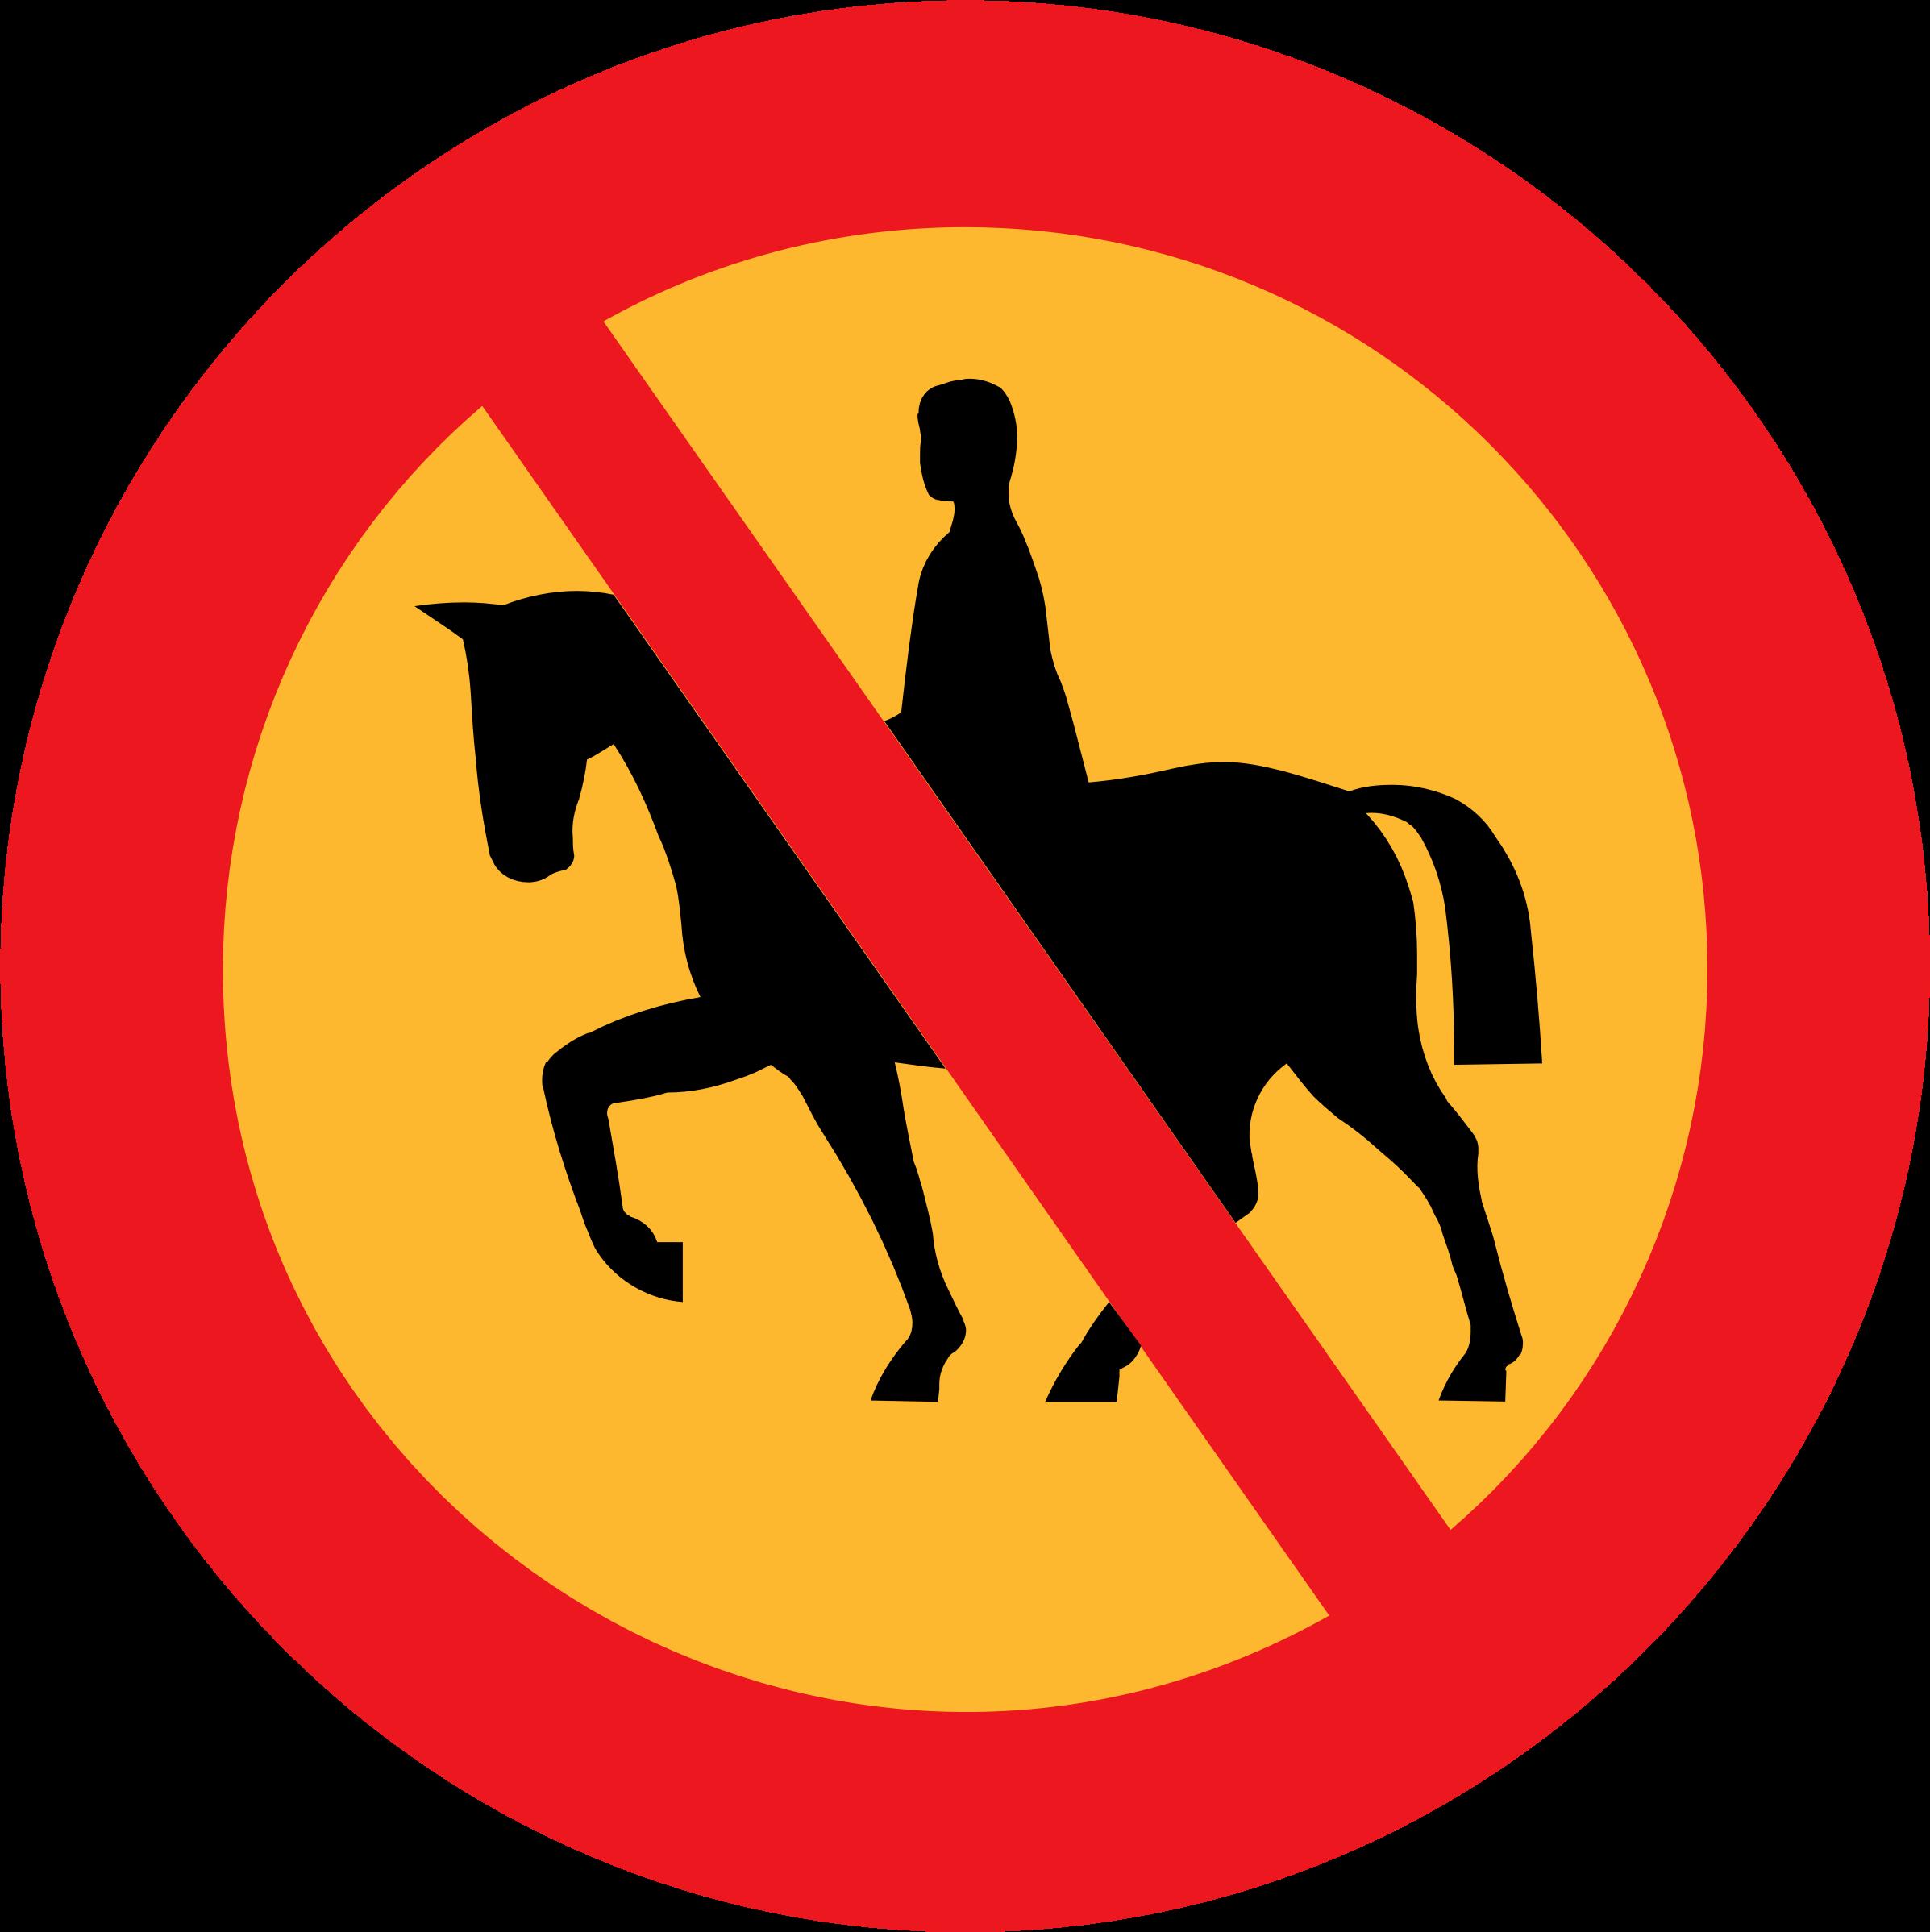 No riding big image. Horse clipart sign